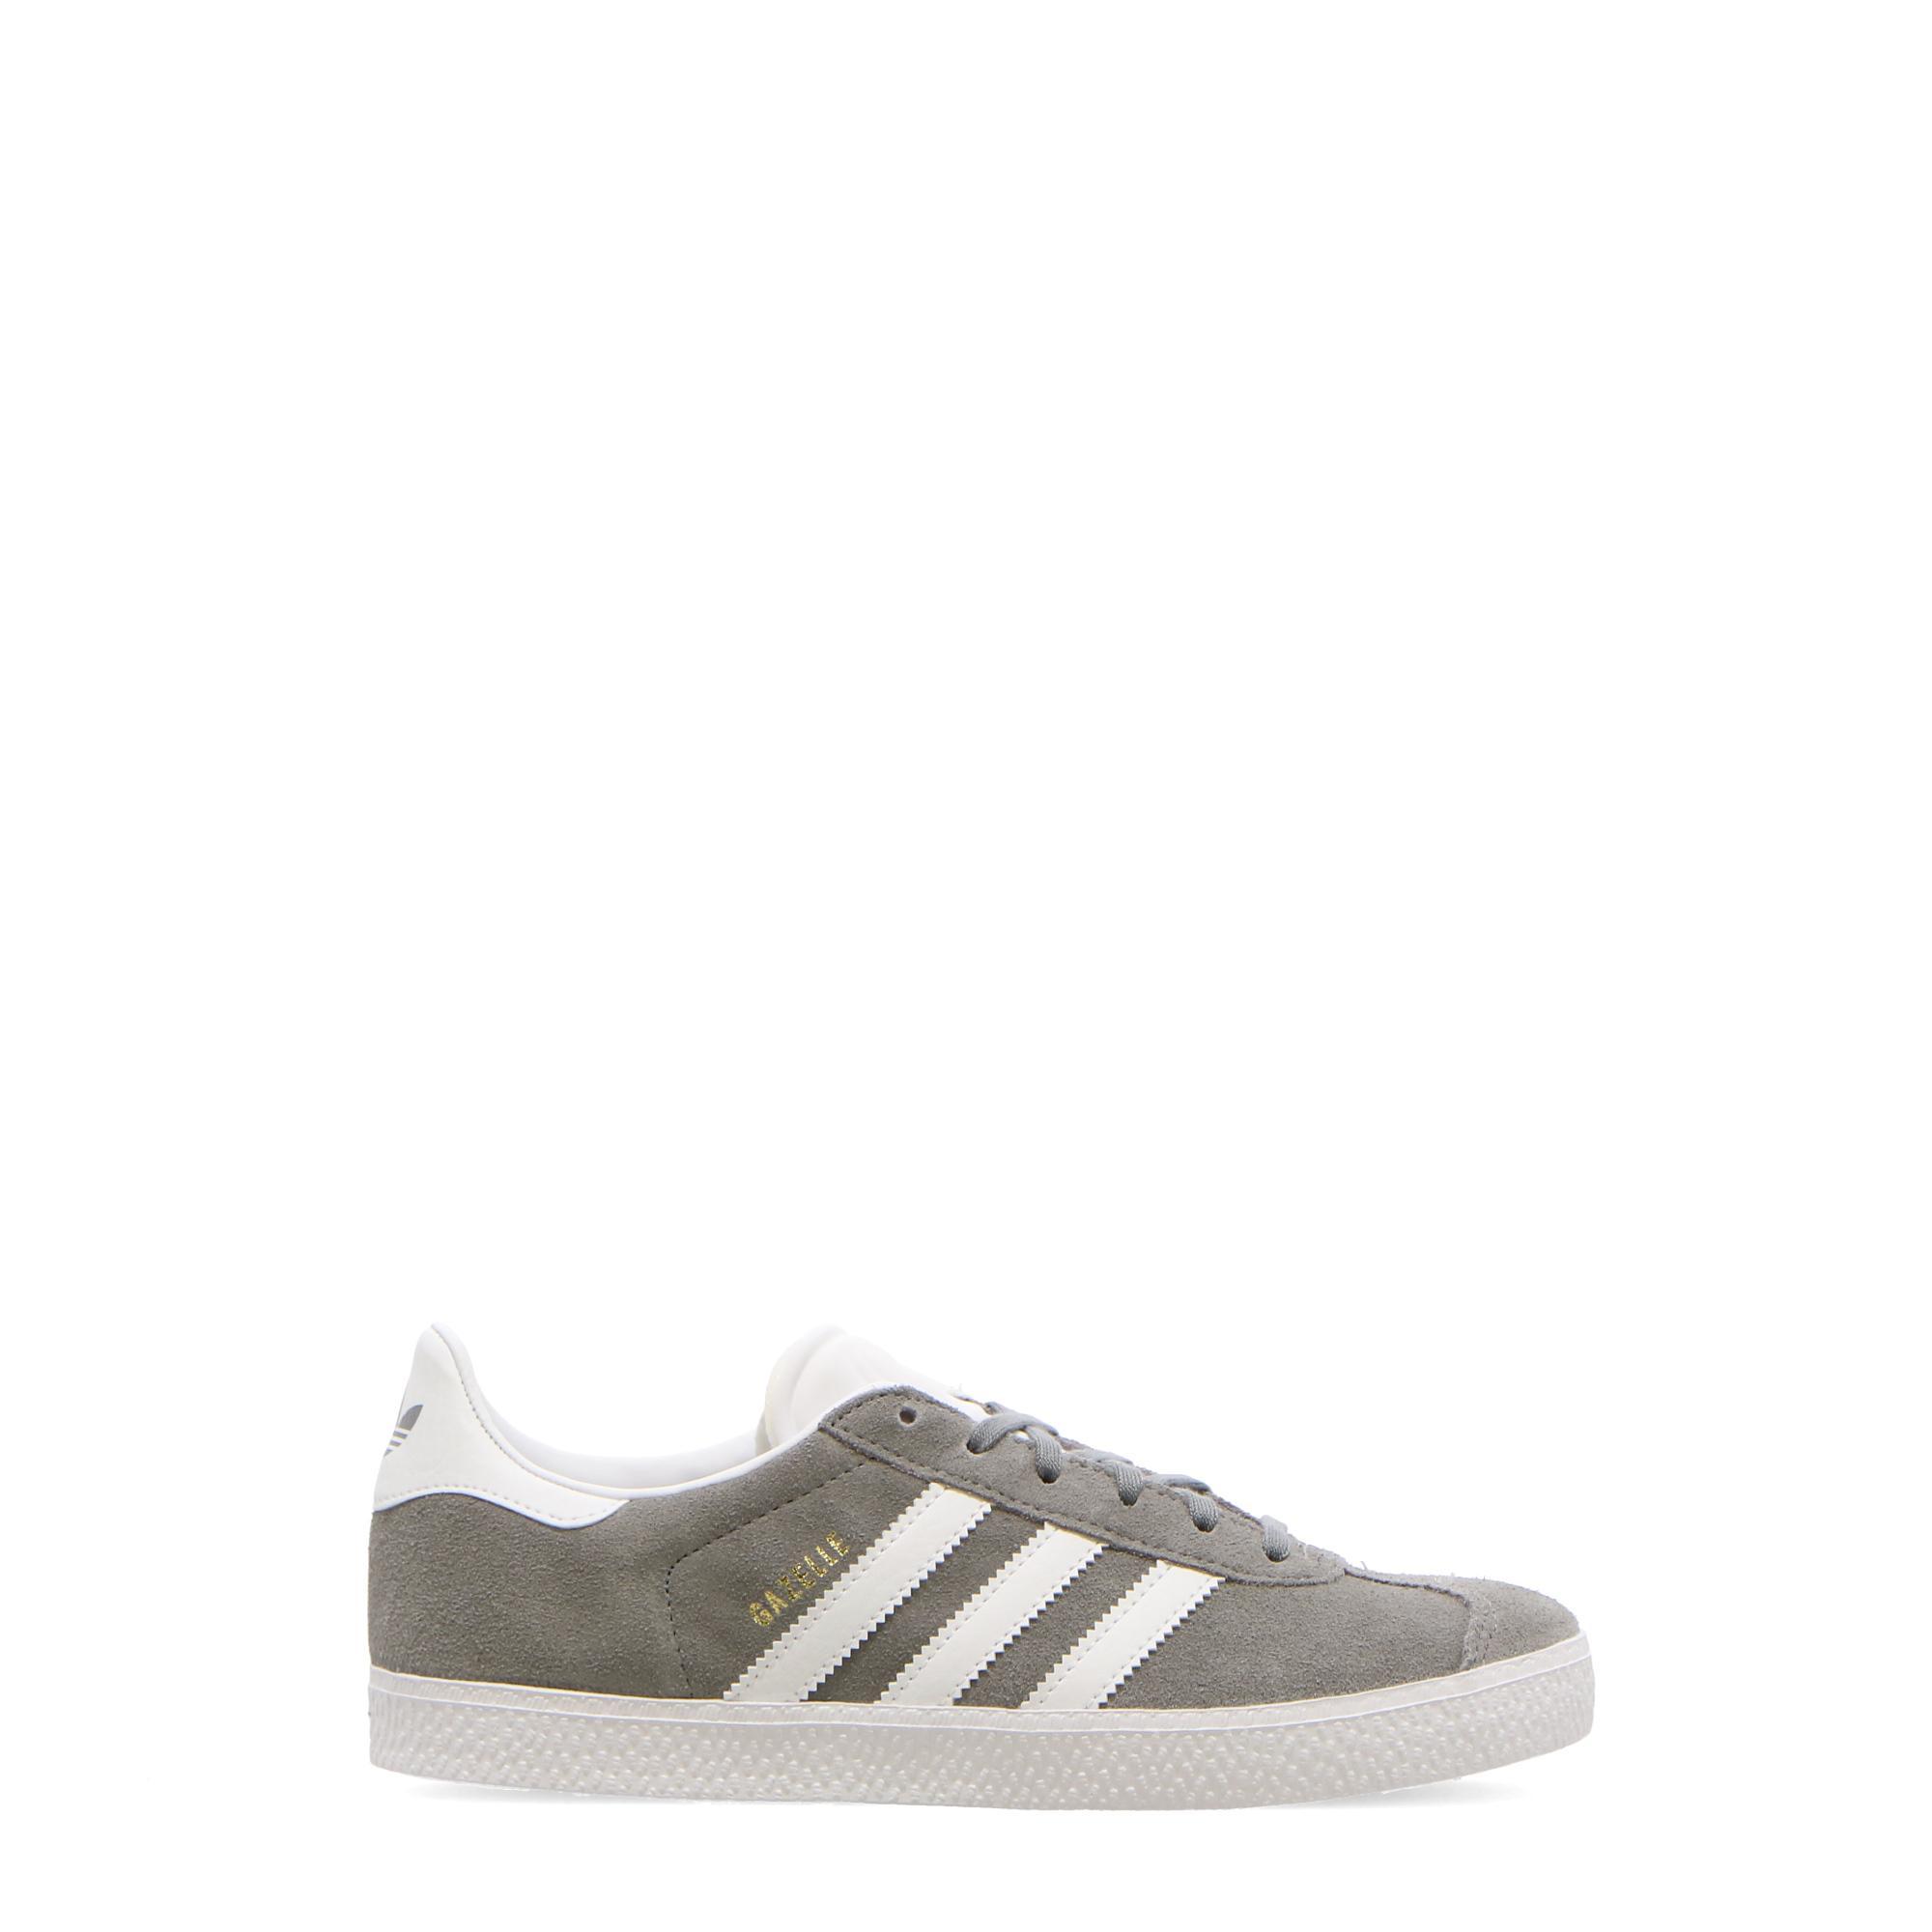 Adidas Gazelle J Grey three white gold met